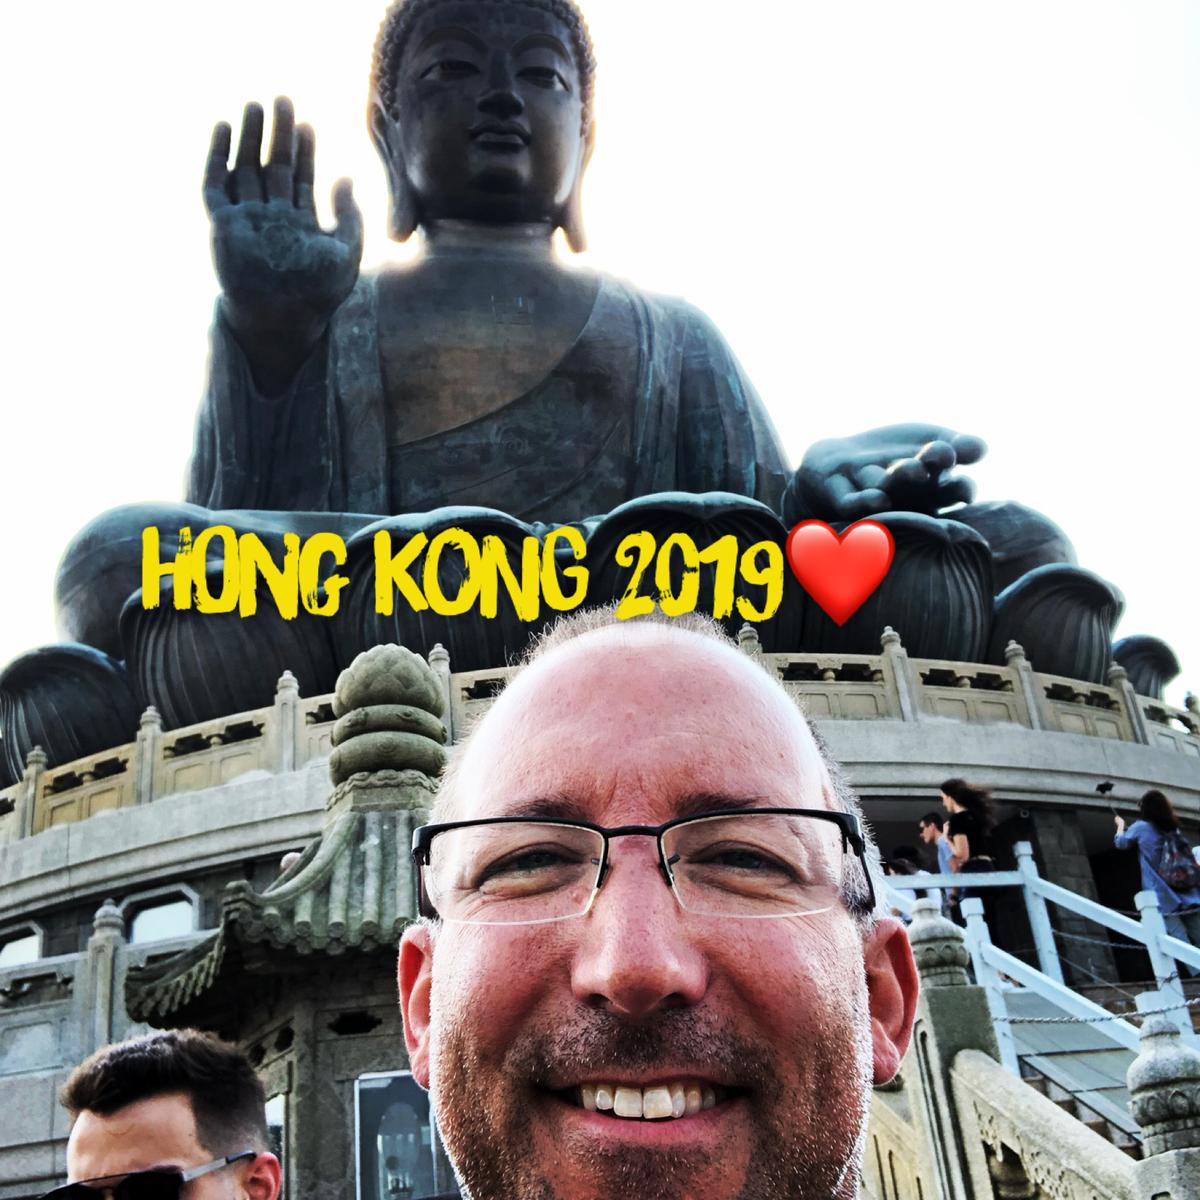 #localhk #victoriapeak #avenueofstars #hongkongcentral #hongkongnight #artbaselhongkong #victoriaharbour #thepeak #hongkongisland #visithongkong #hongkongview #travelhongkong #hongkongcity #ilovehongkong #lantau #discoverhongkong #hongkongtravel #hongkong #hongkongstreet...pic.twitter.com/aoEJskFezn